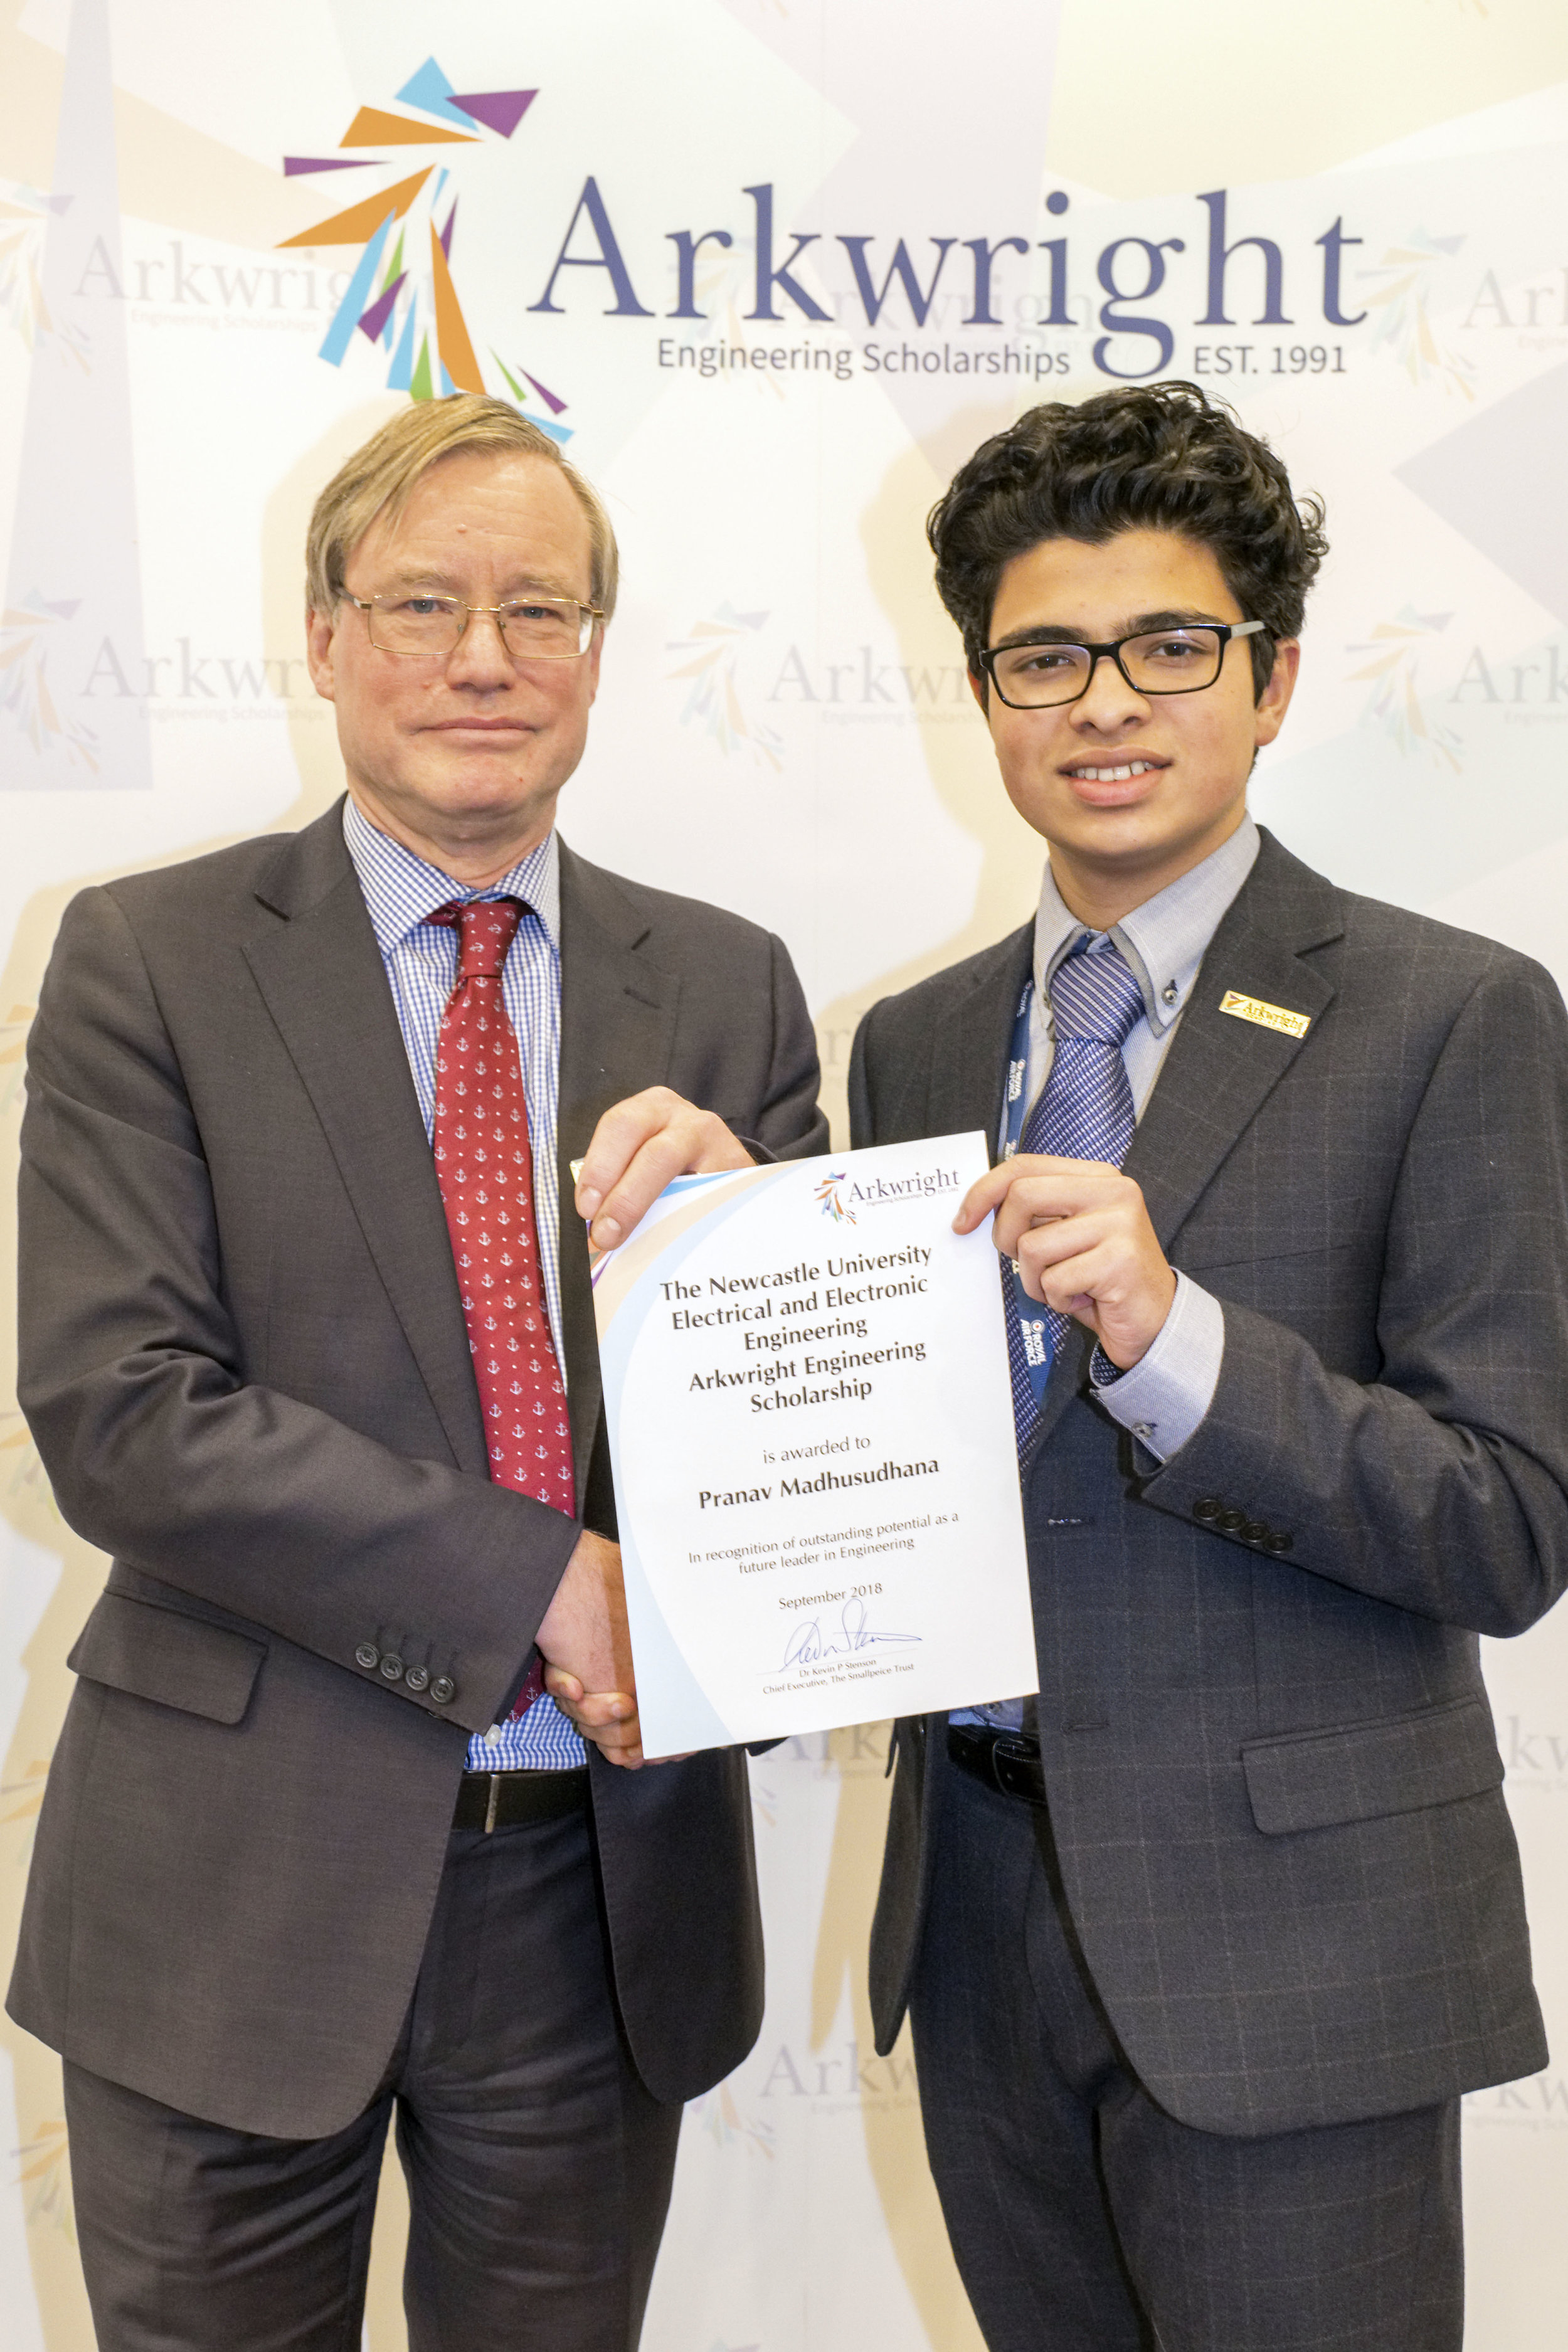 Pranav Madhusudhana receiving his certificate